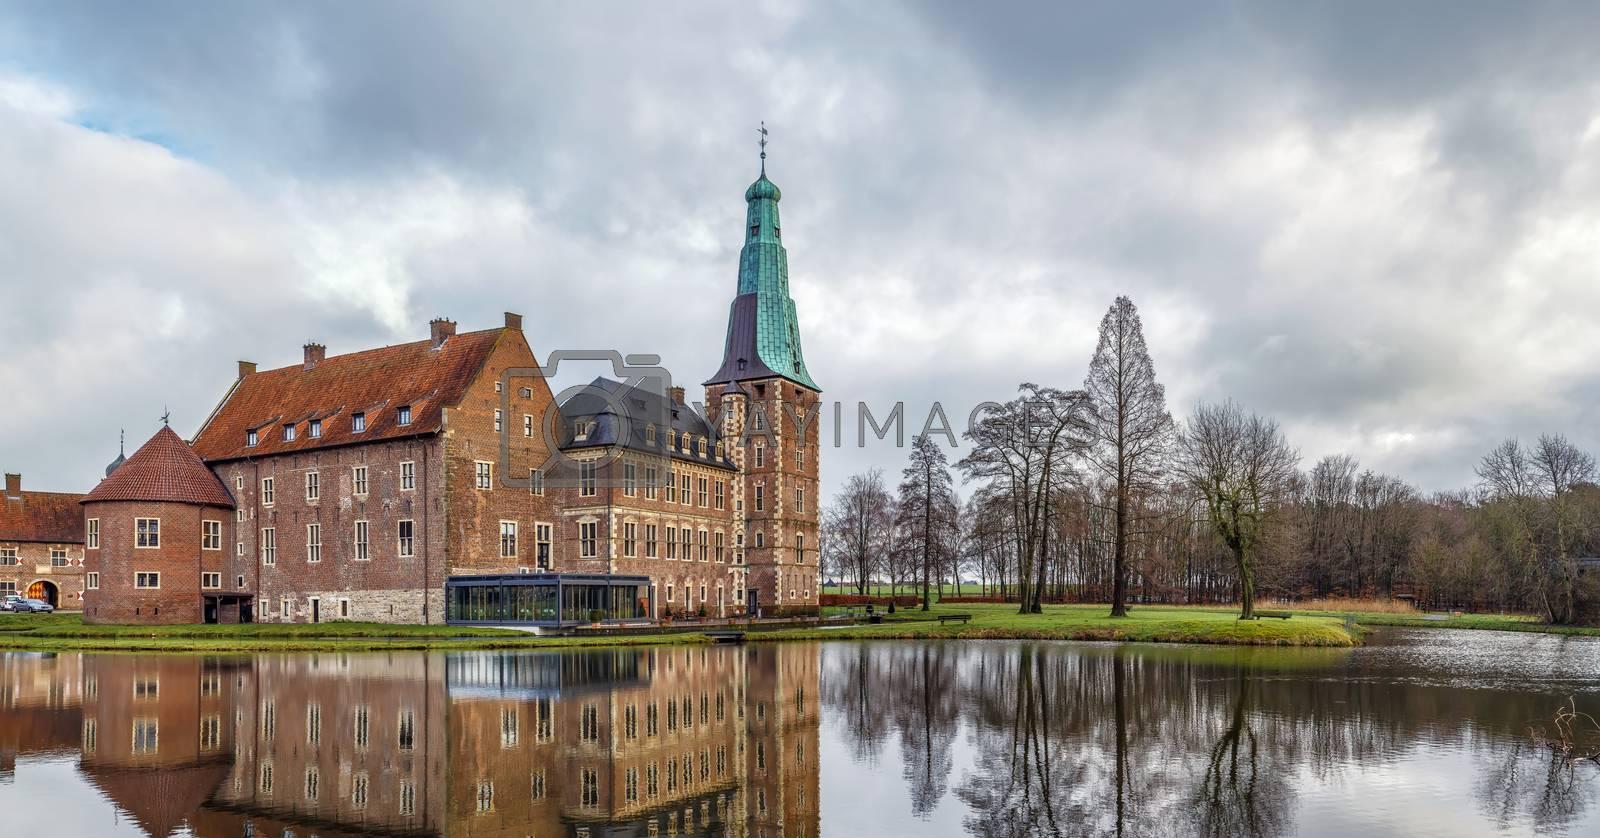 Royalty free image of Raesfeld Castle, Germany by borisb17